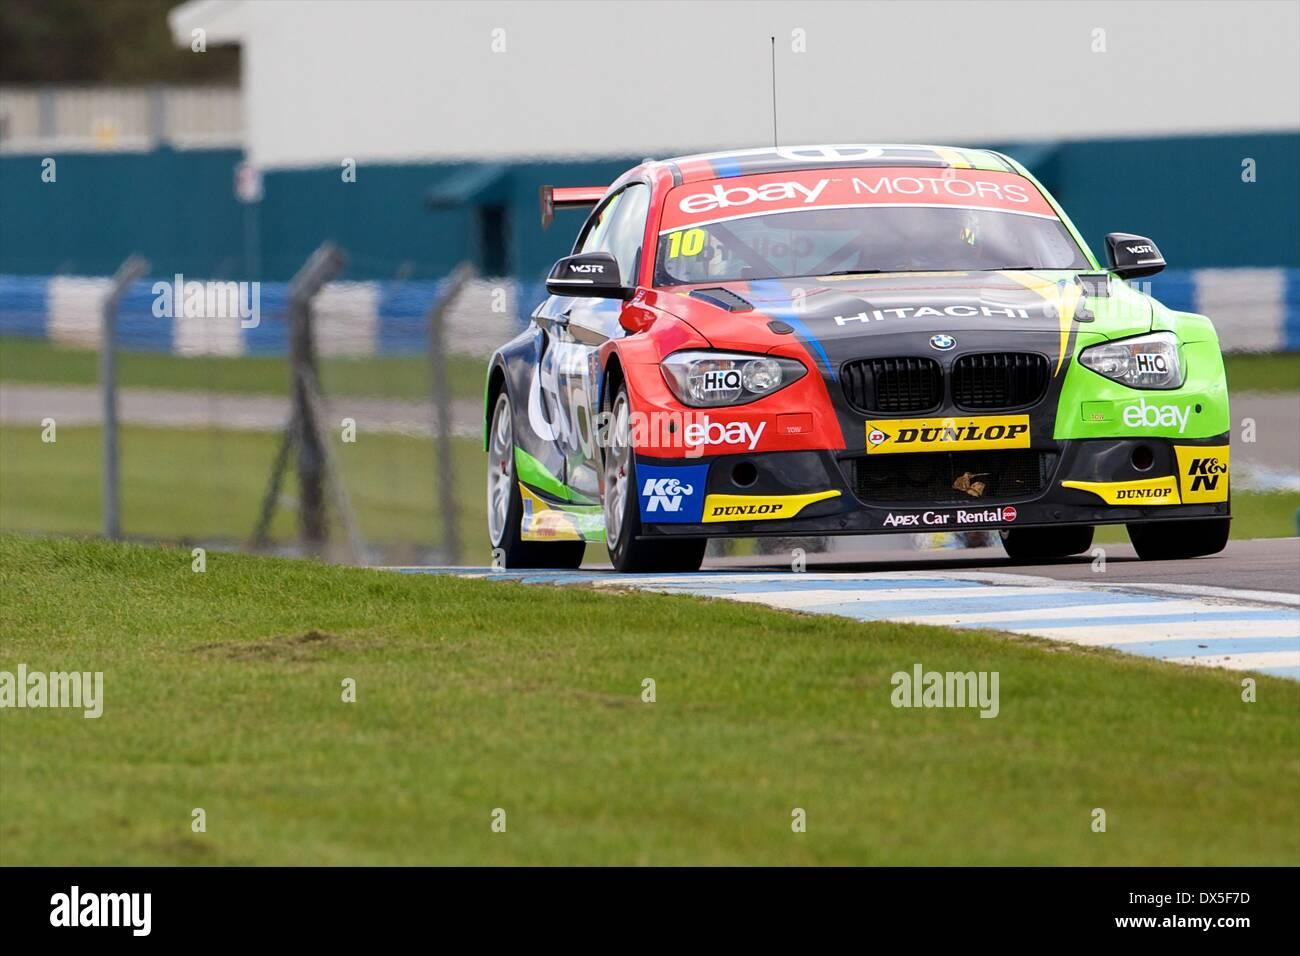 Donington, UK. 18th Mar, 2014. Rob Collard driving his eBay Motors ...